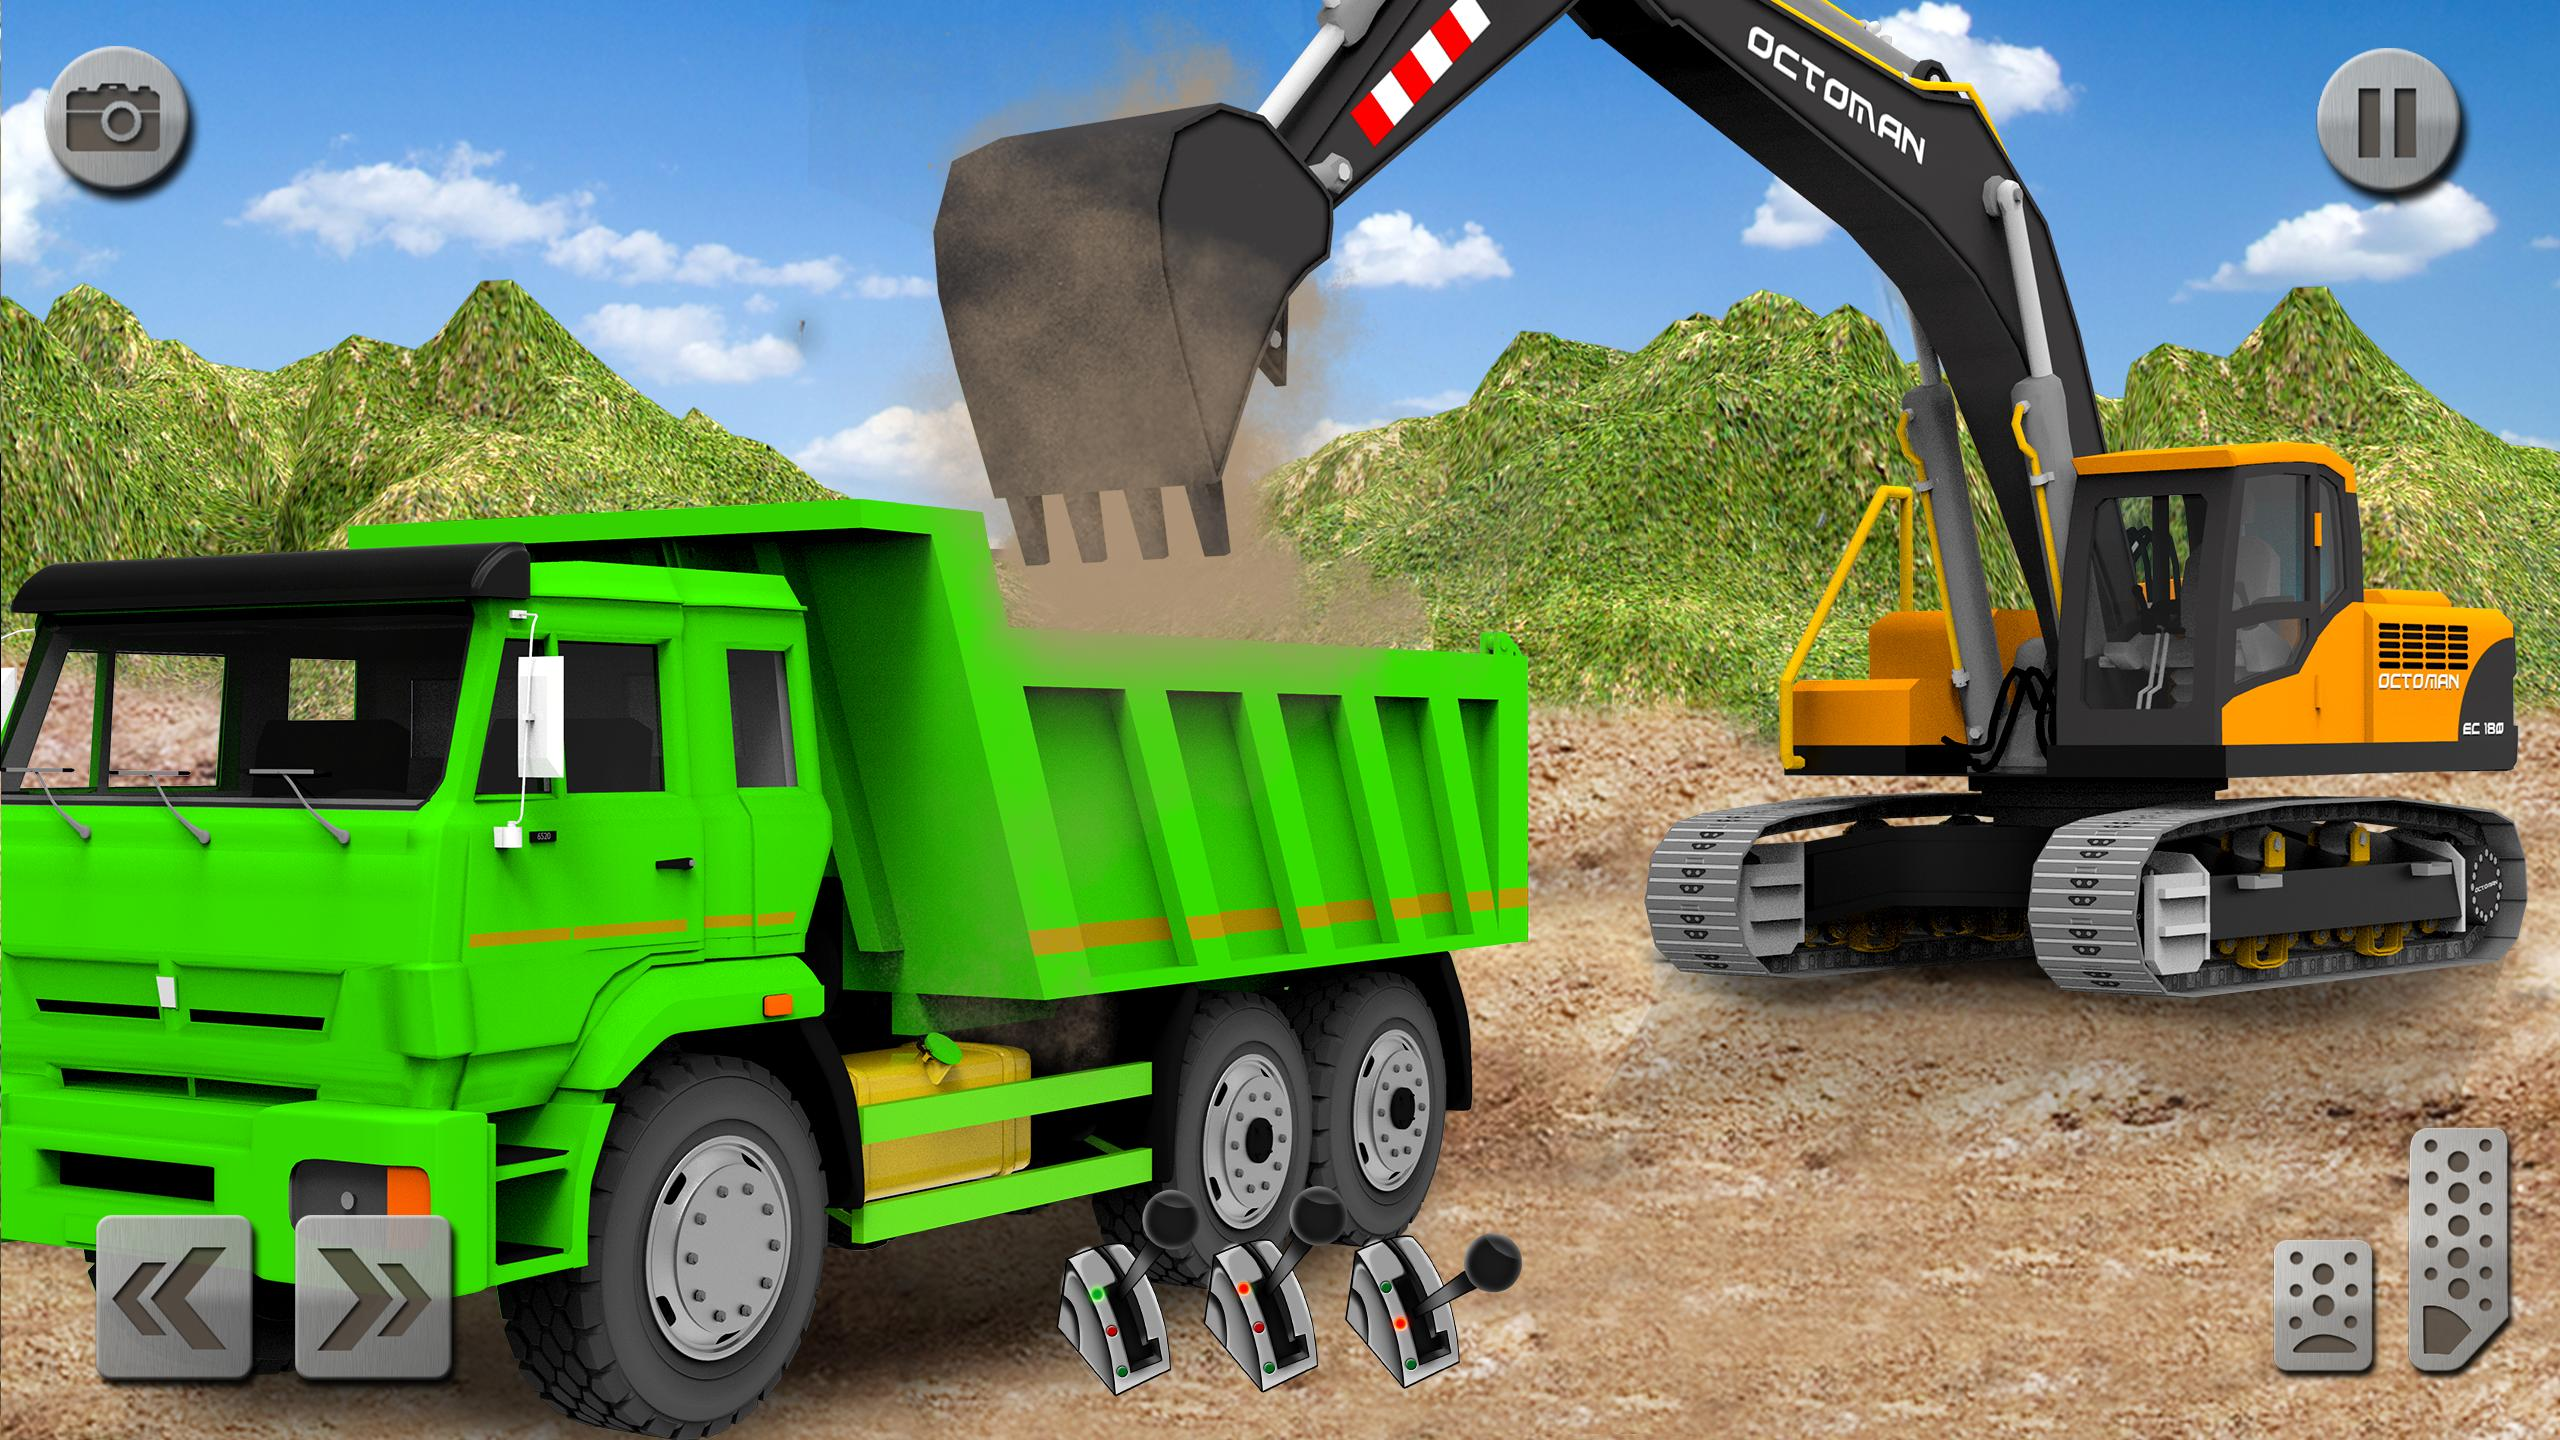 Sand Excavator Truck Driving Rescue Simulator game 5.2 Screenshot 1